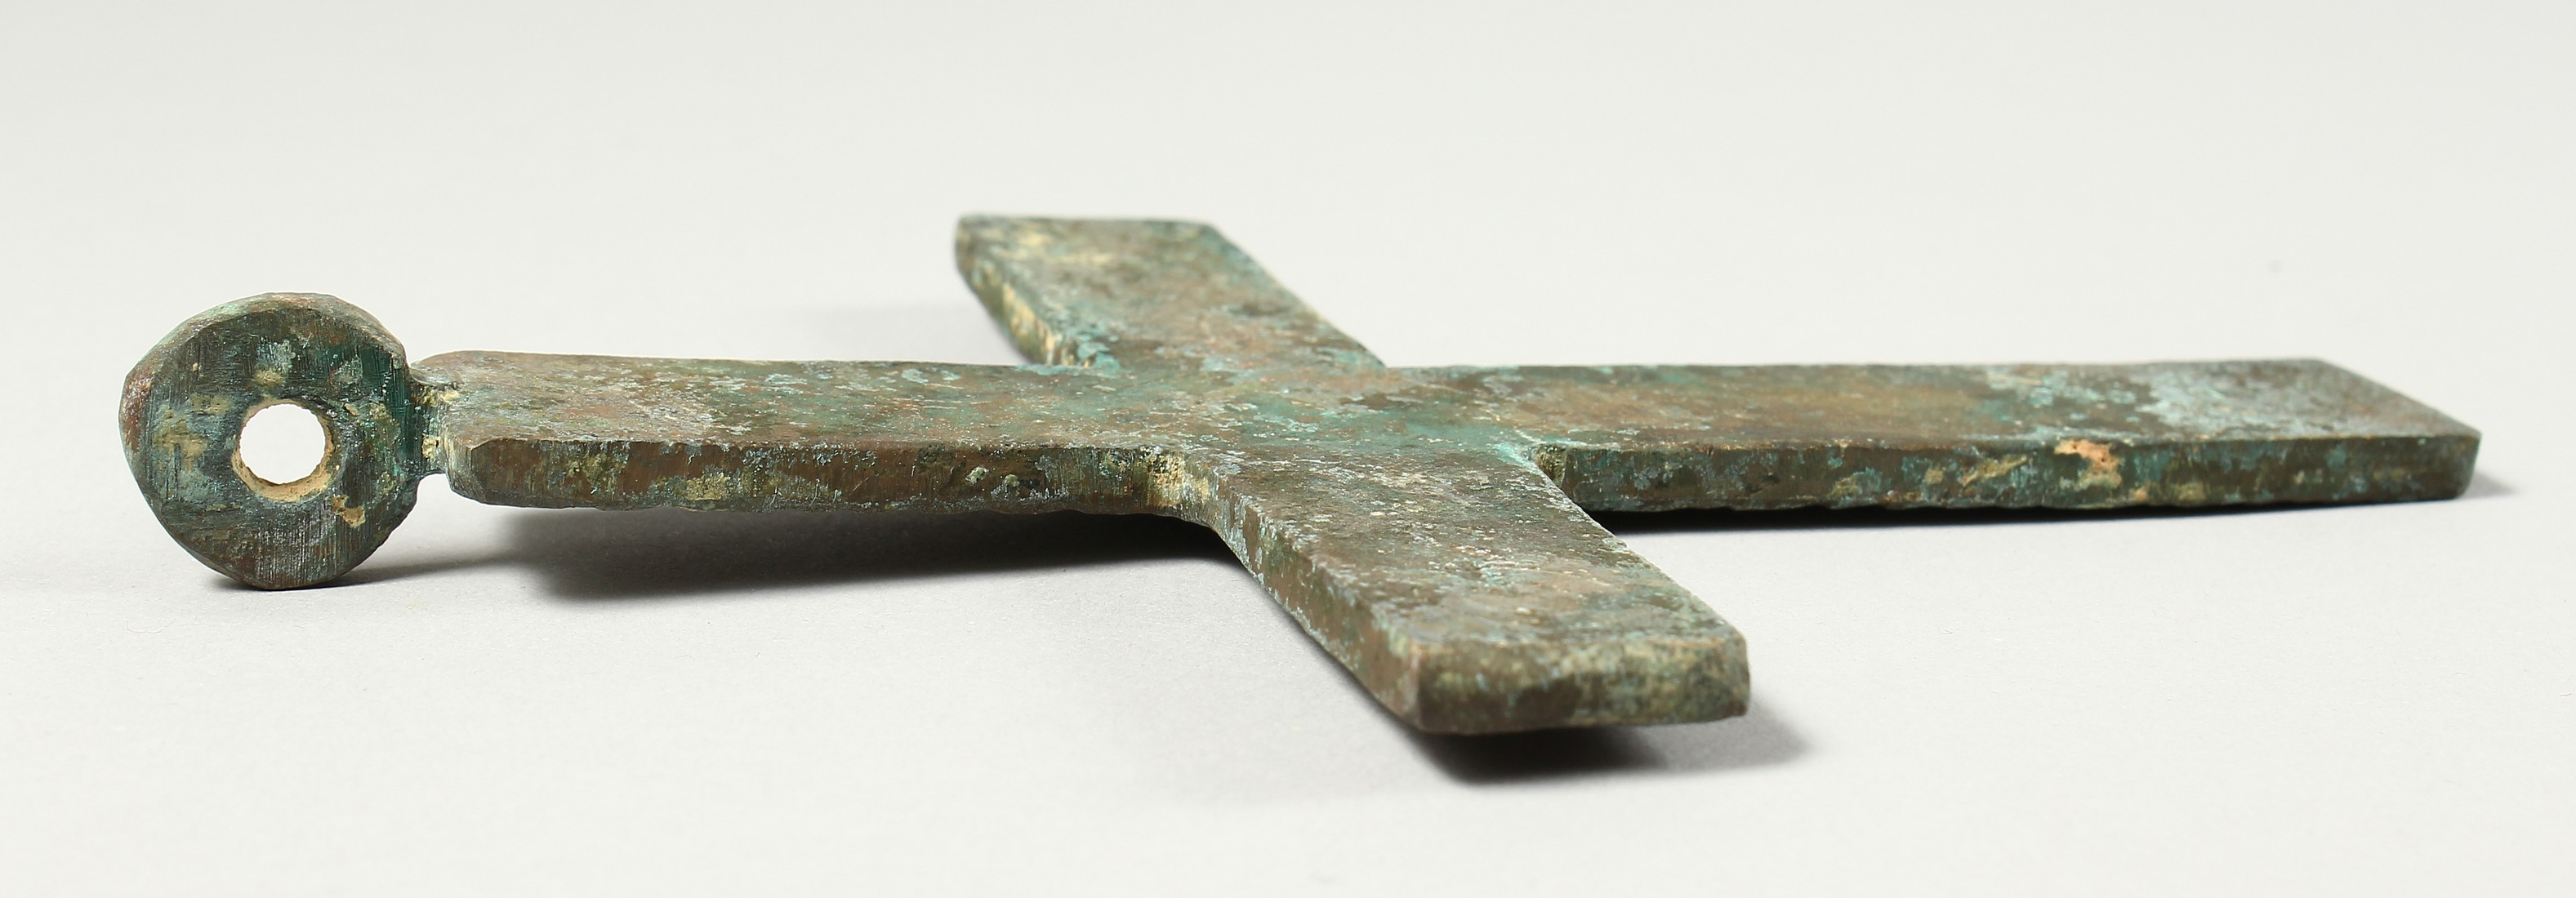 A LARGE METAL ROMAN CROSS. 6ins long - Image 3 of 3